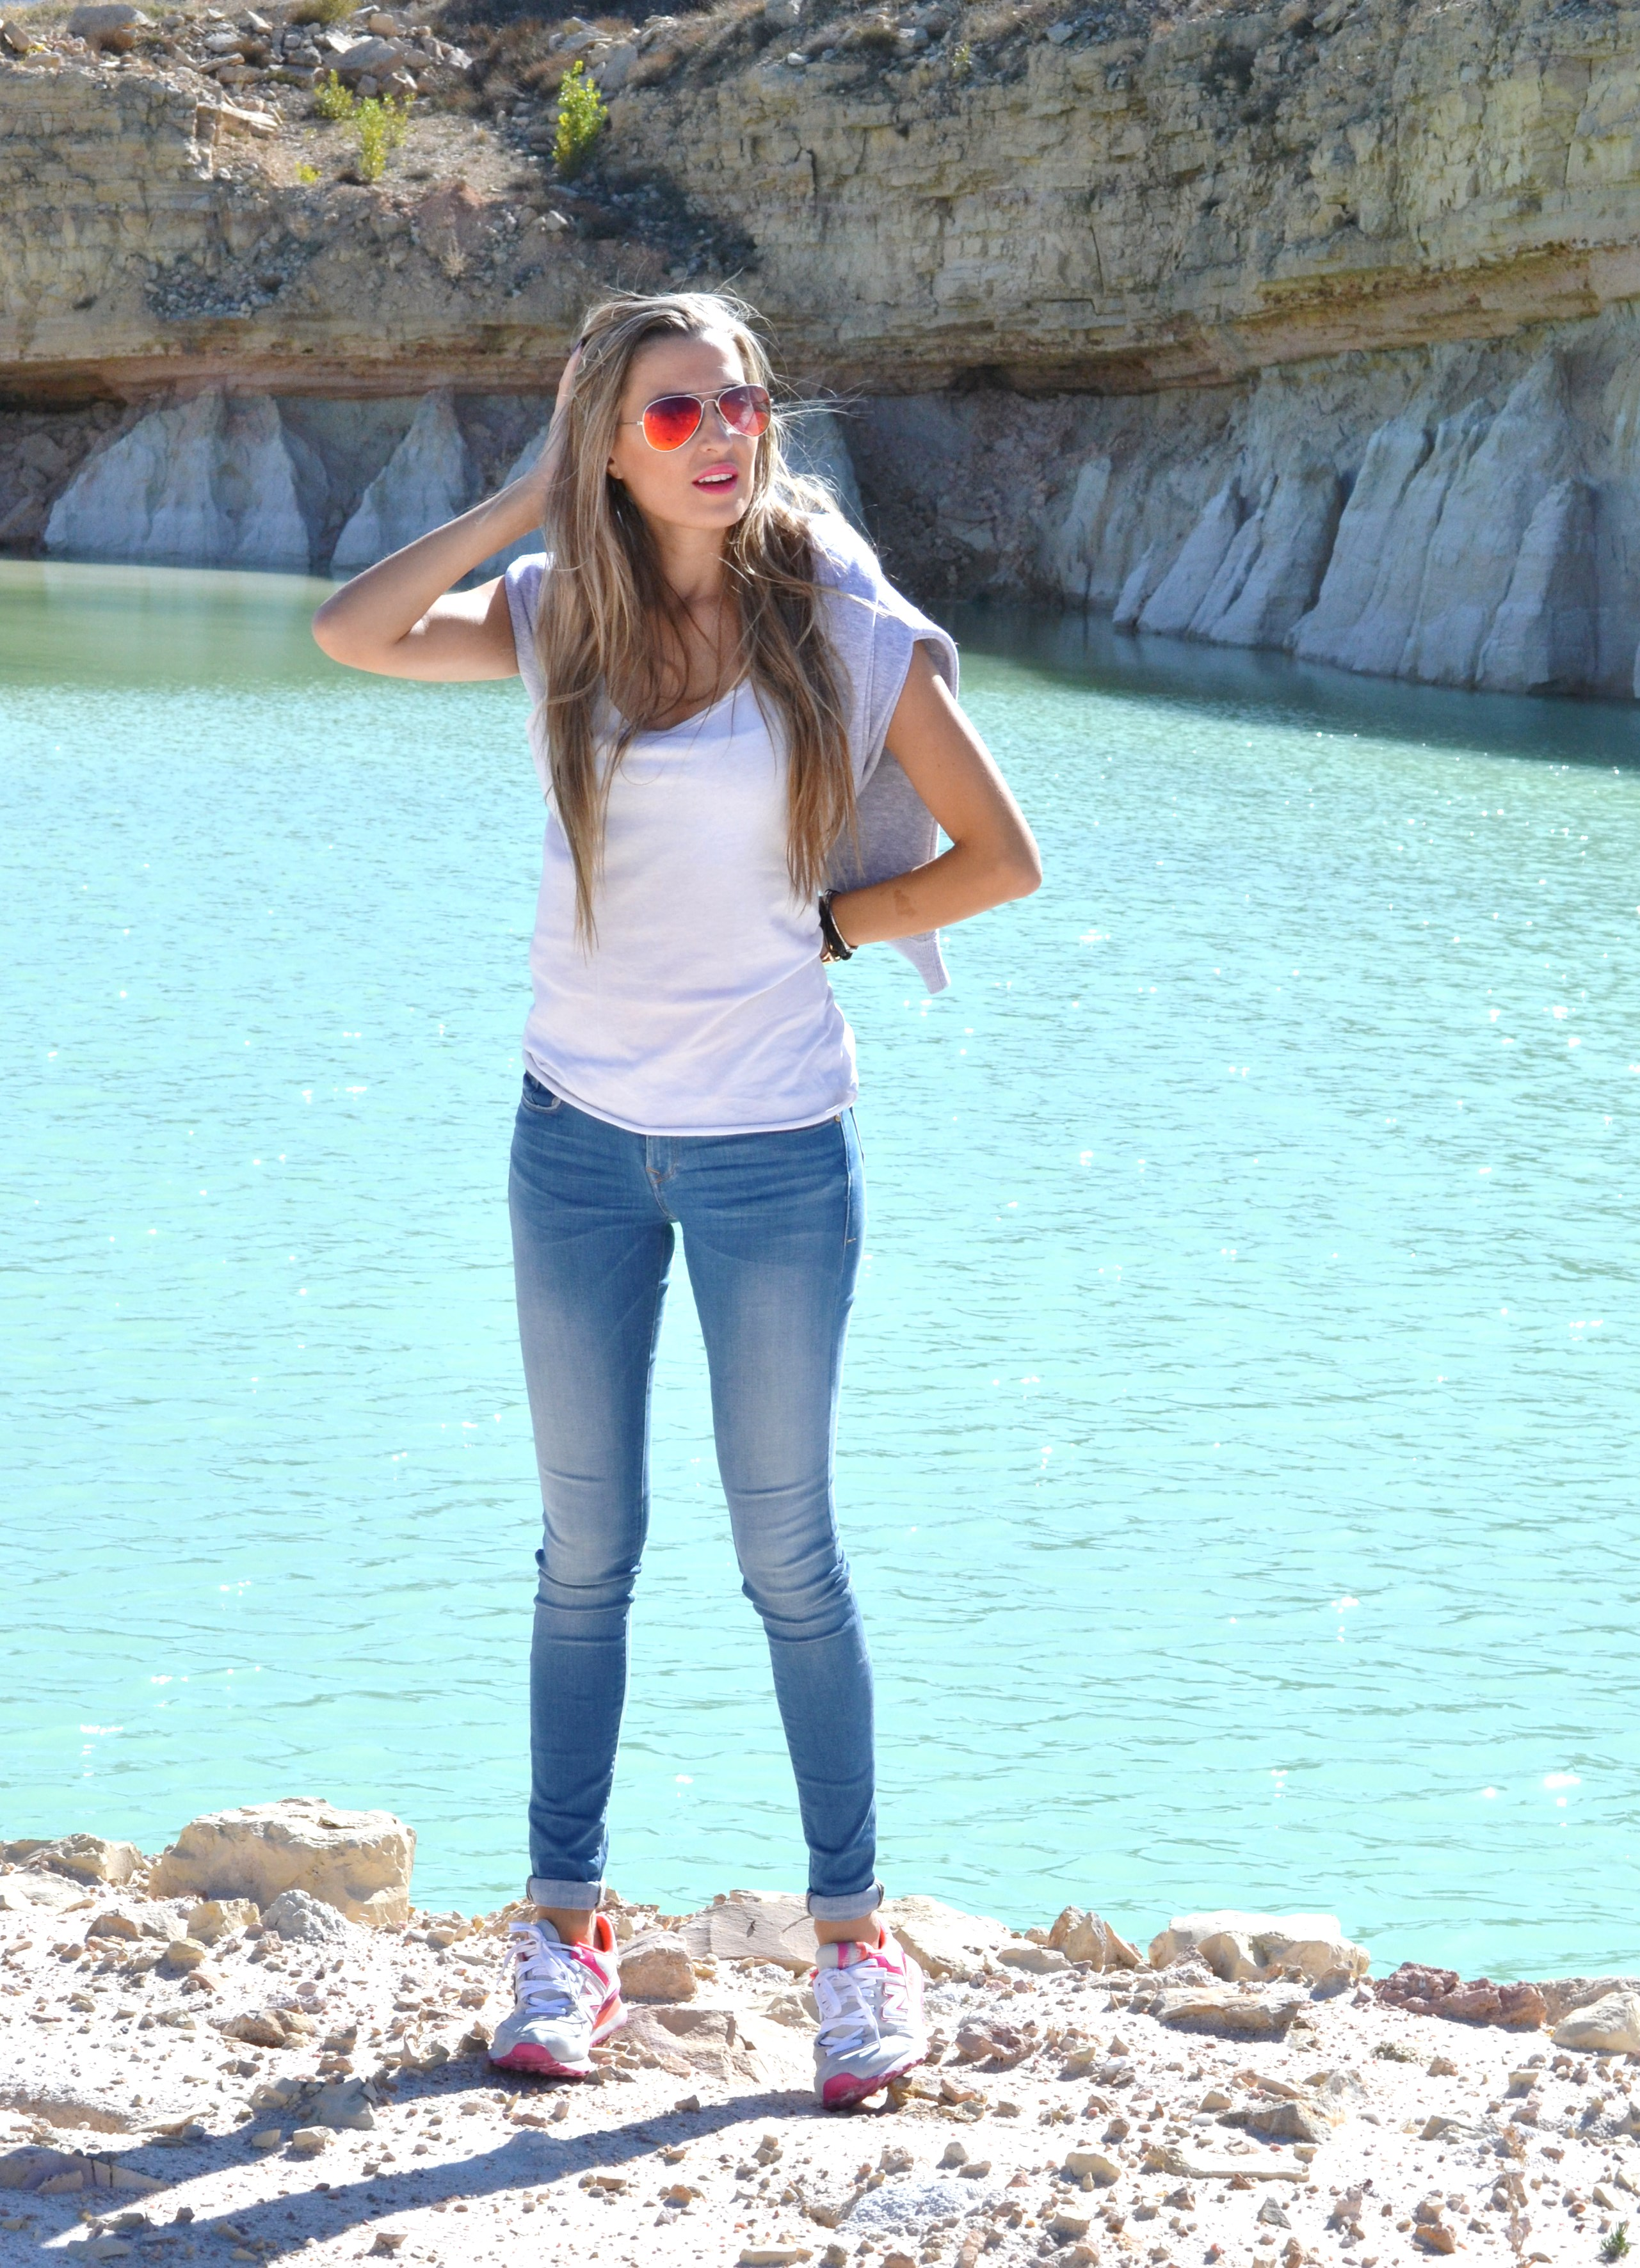 Skinny_Jeans_Sweatshirt_New_Balance_Tank_Top_Blenders_Salsa_Jeans_Lara_Martin_Gilarranz_Bymyheels (3)